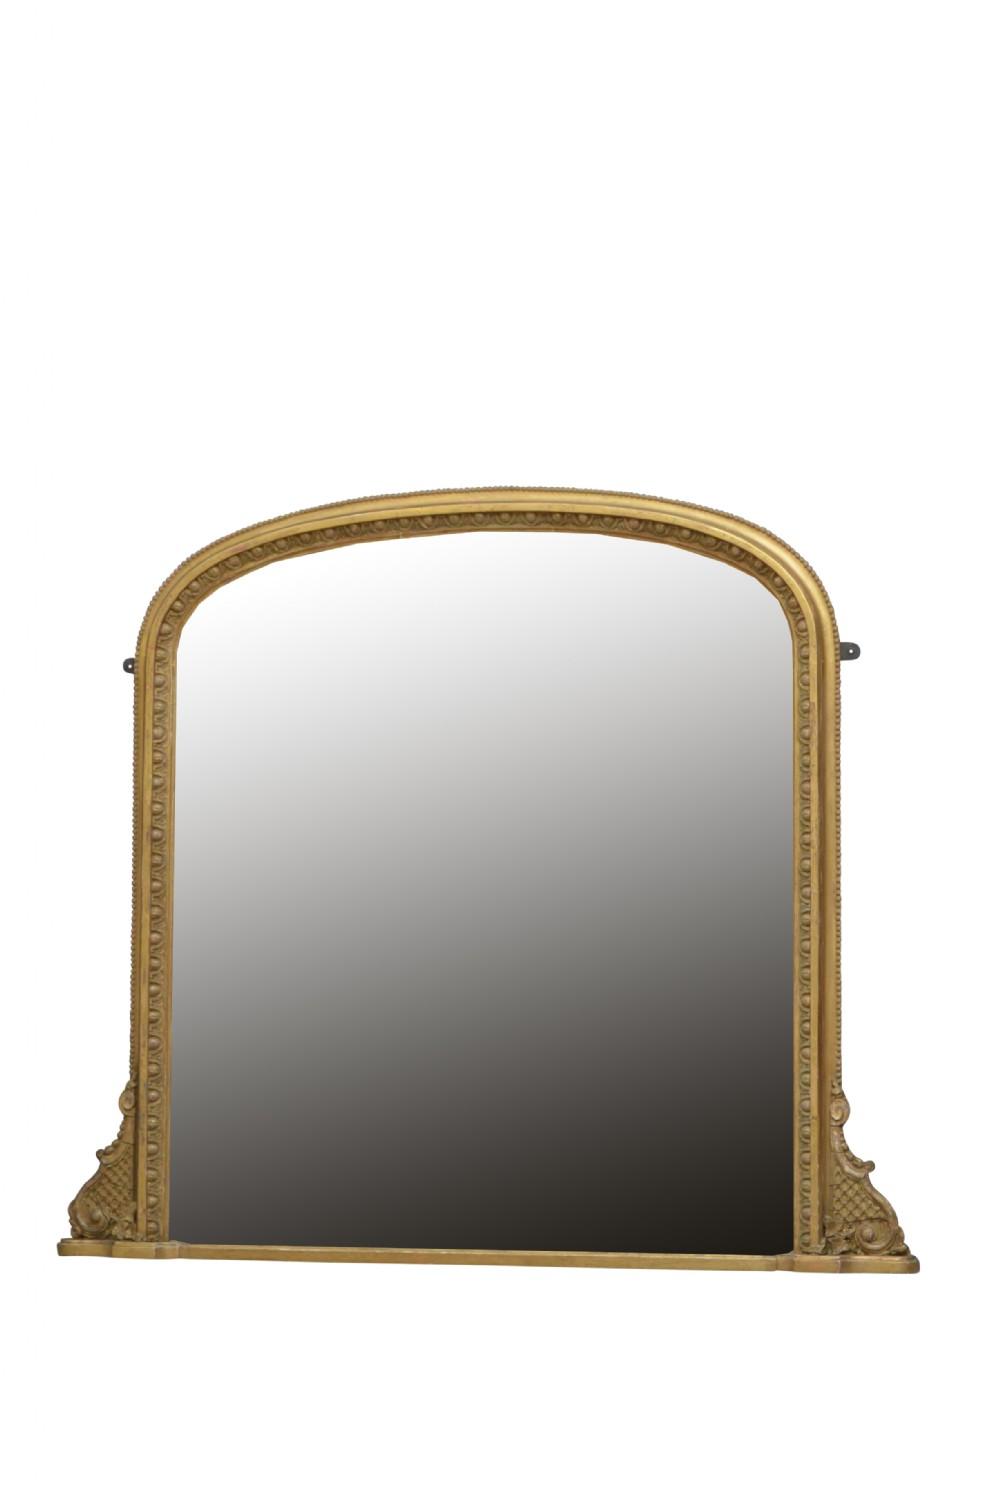 regency giltwood wall mirror